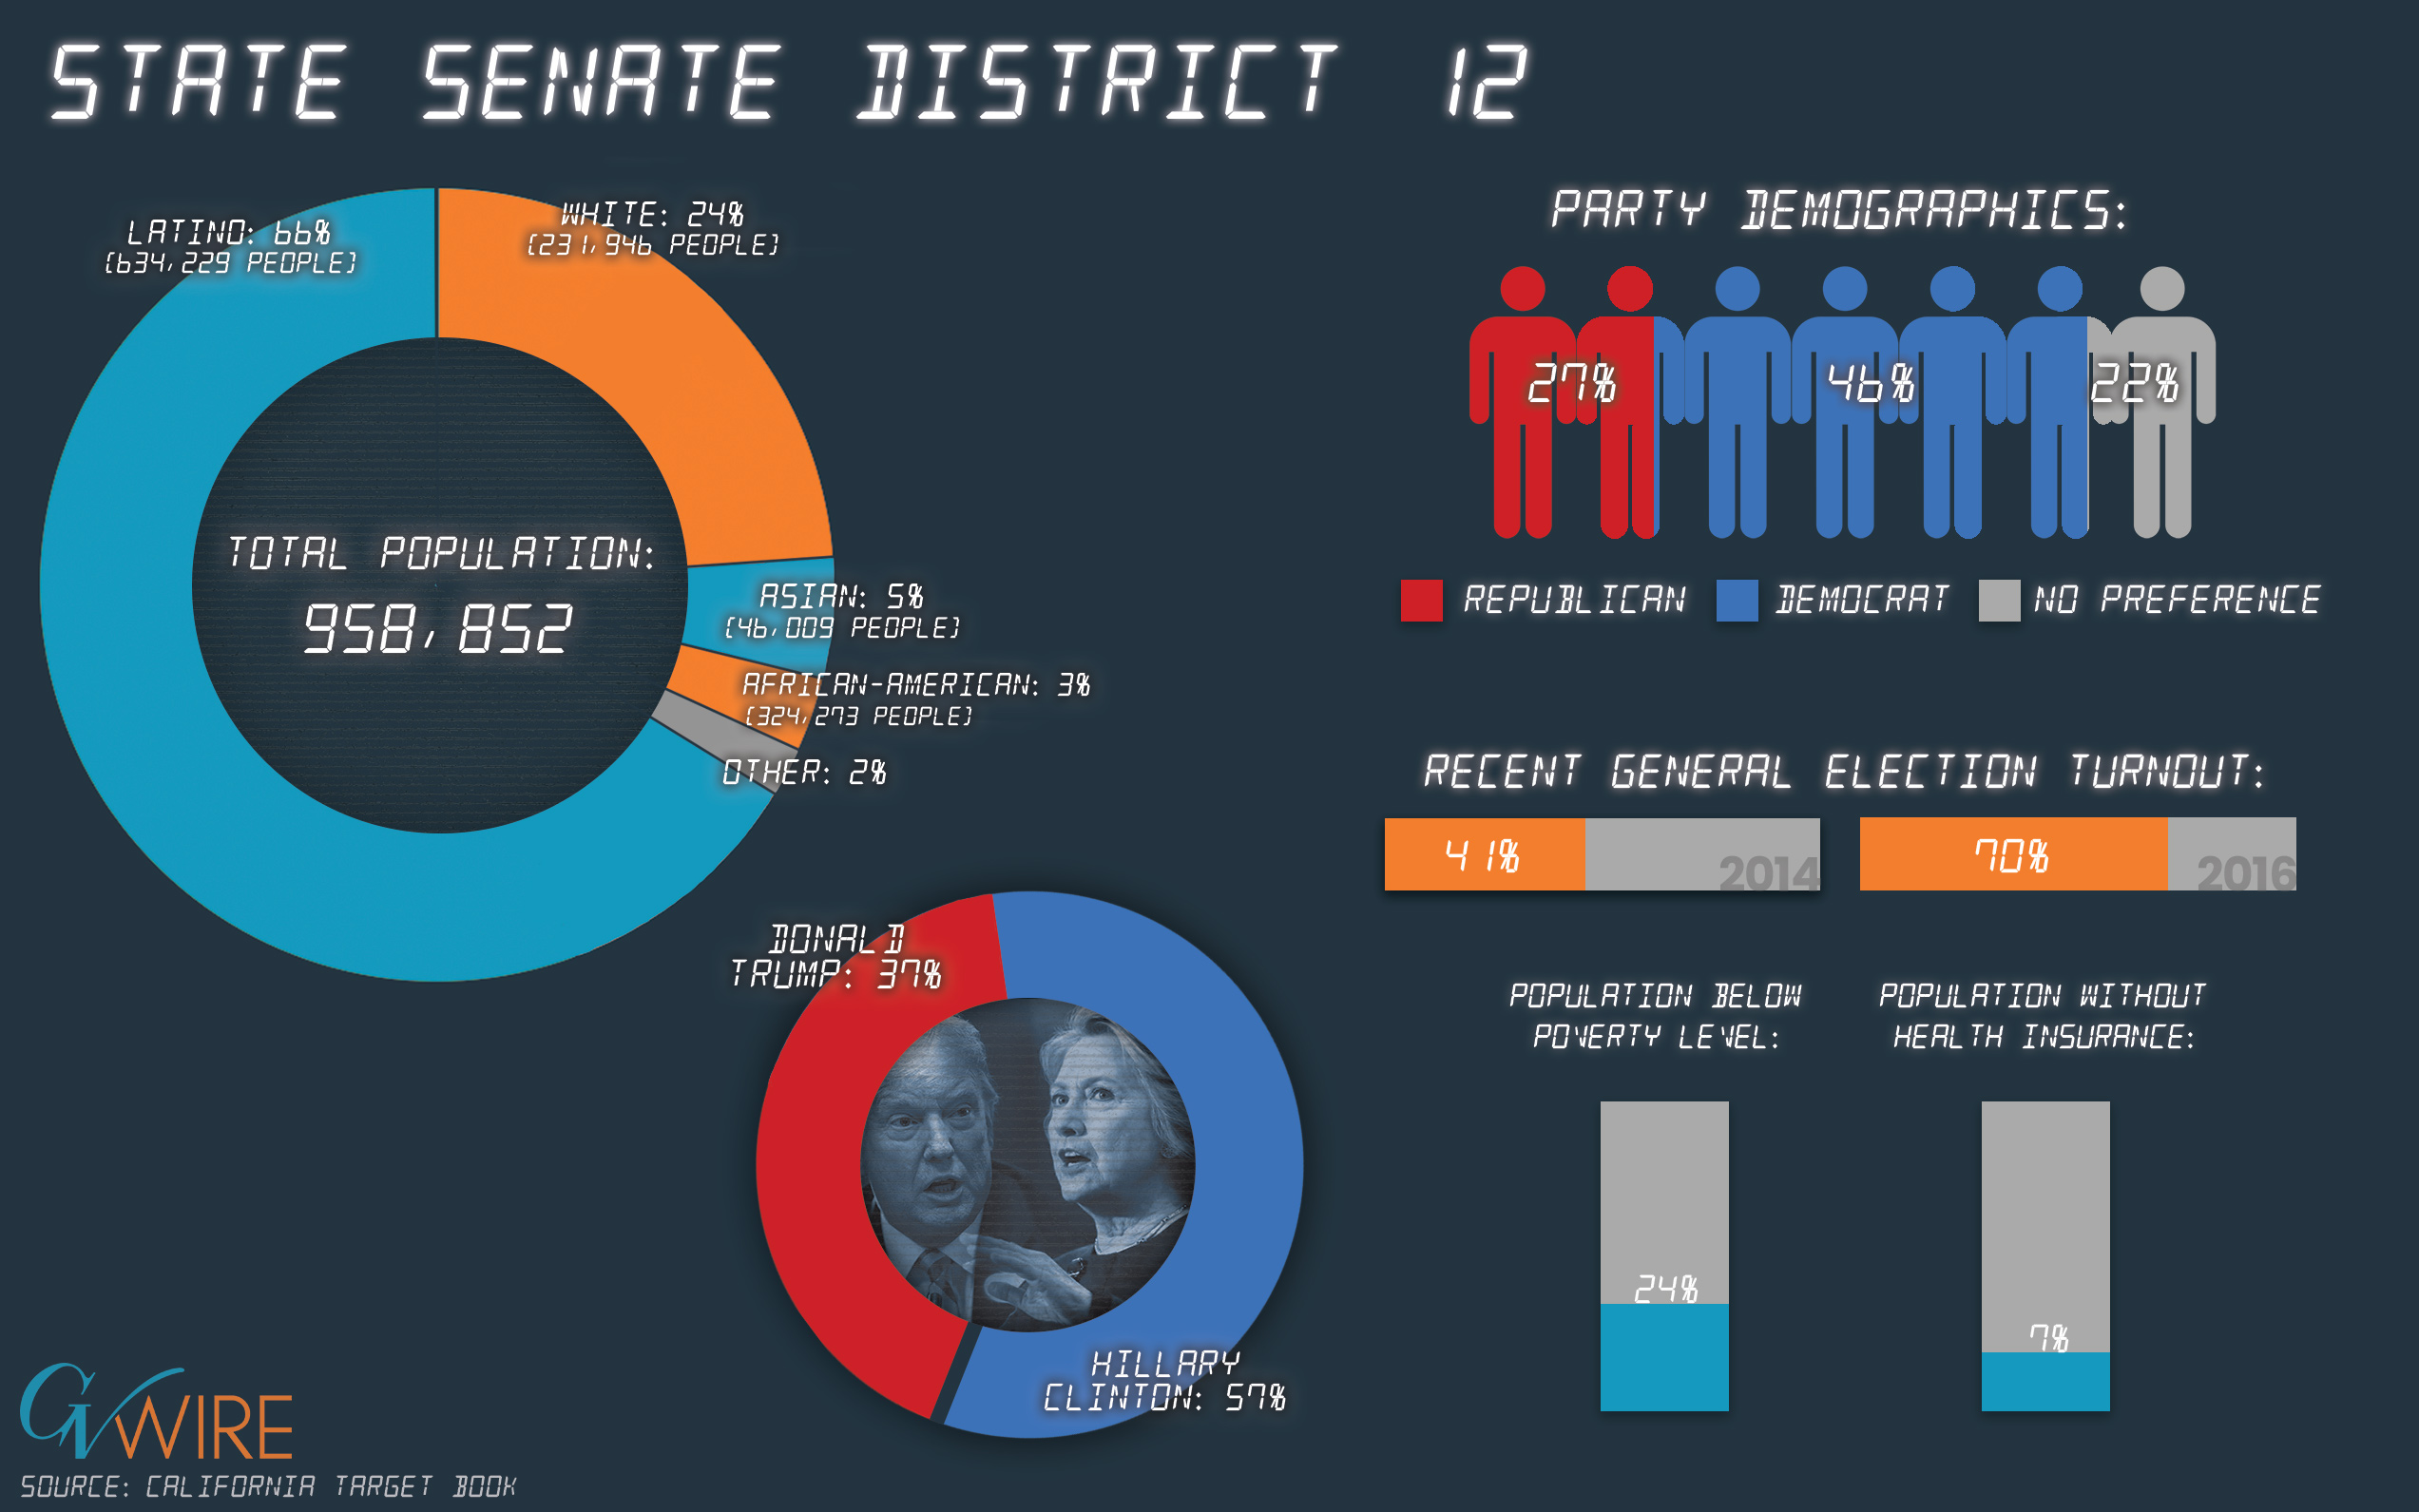 Infographic showing State Senate 12 population demographics